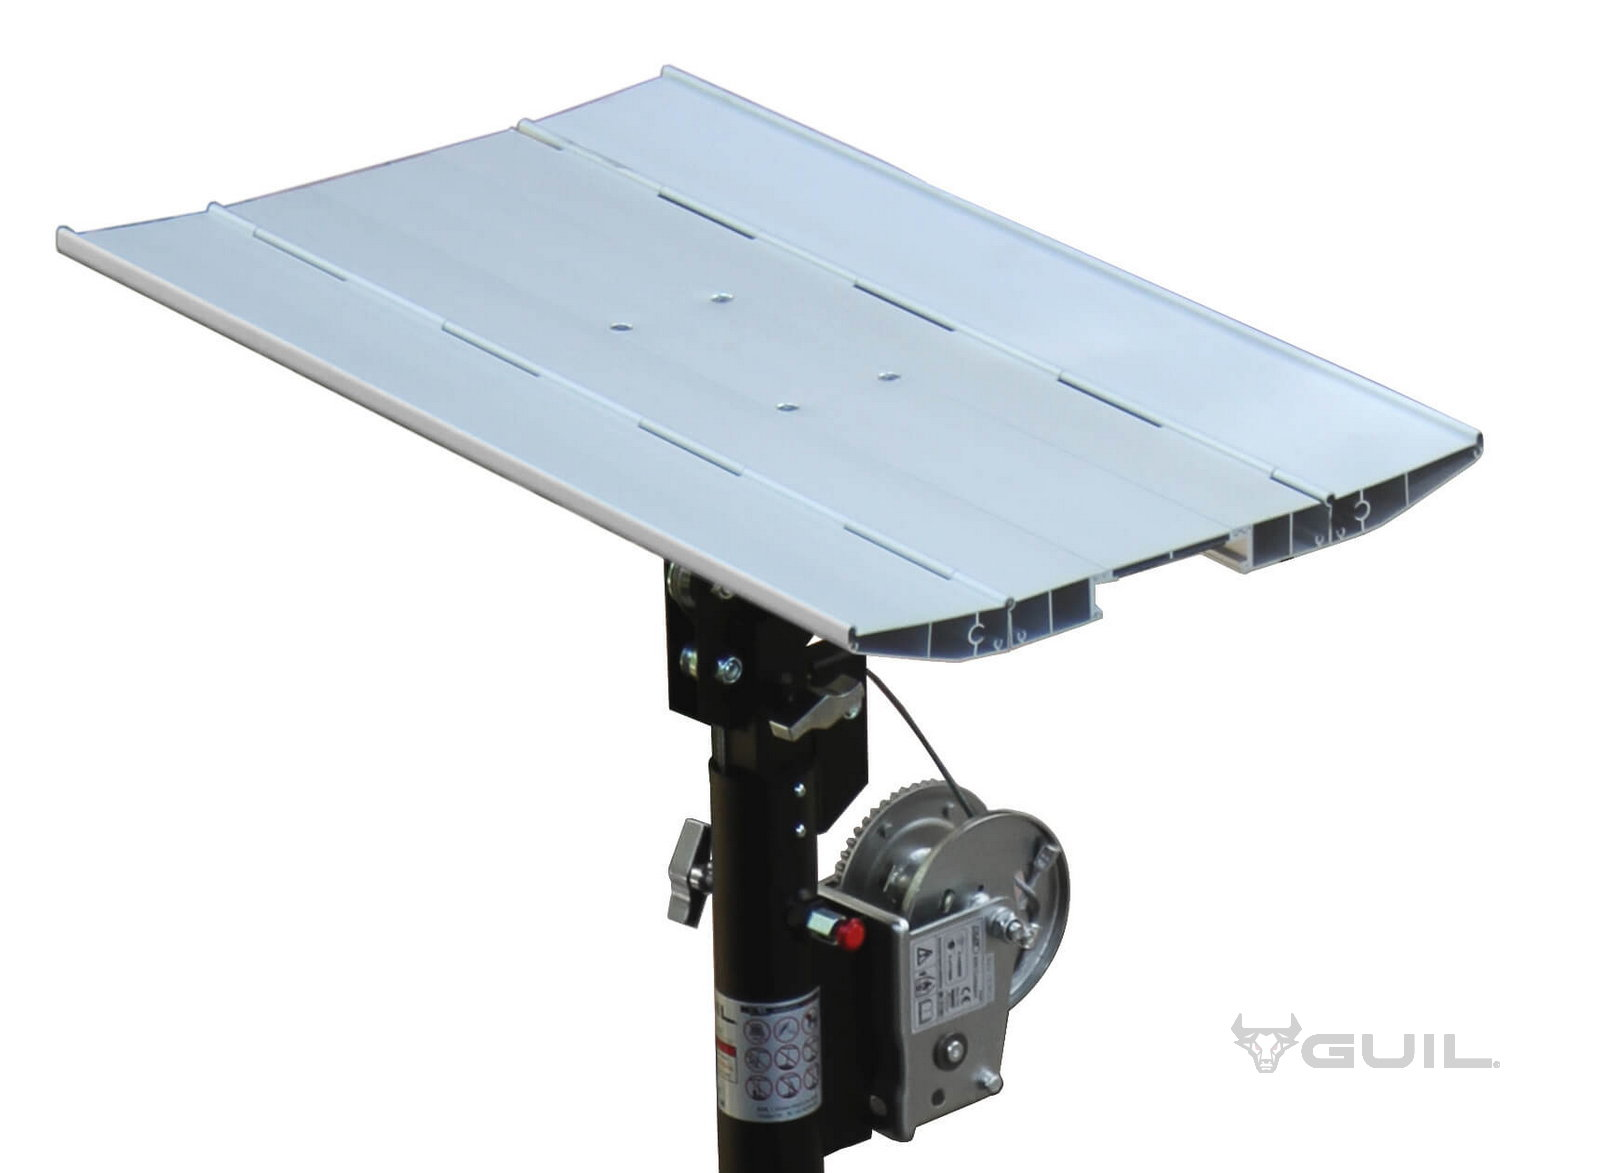 Platform aluminium (750x435) ELC-720,730,750,760 (dutch) (1)